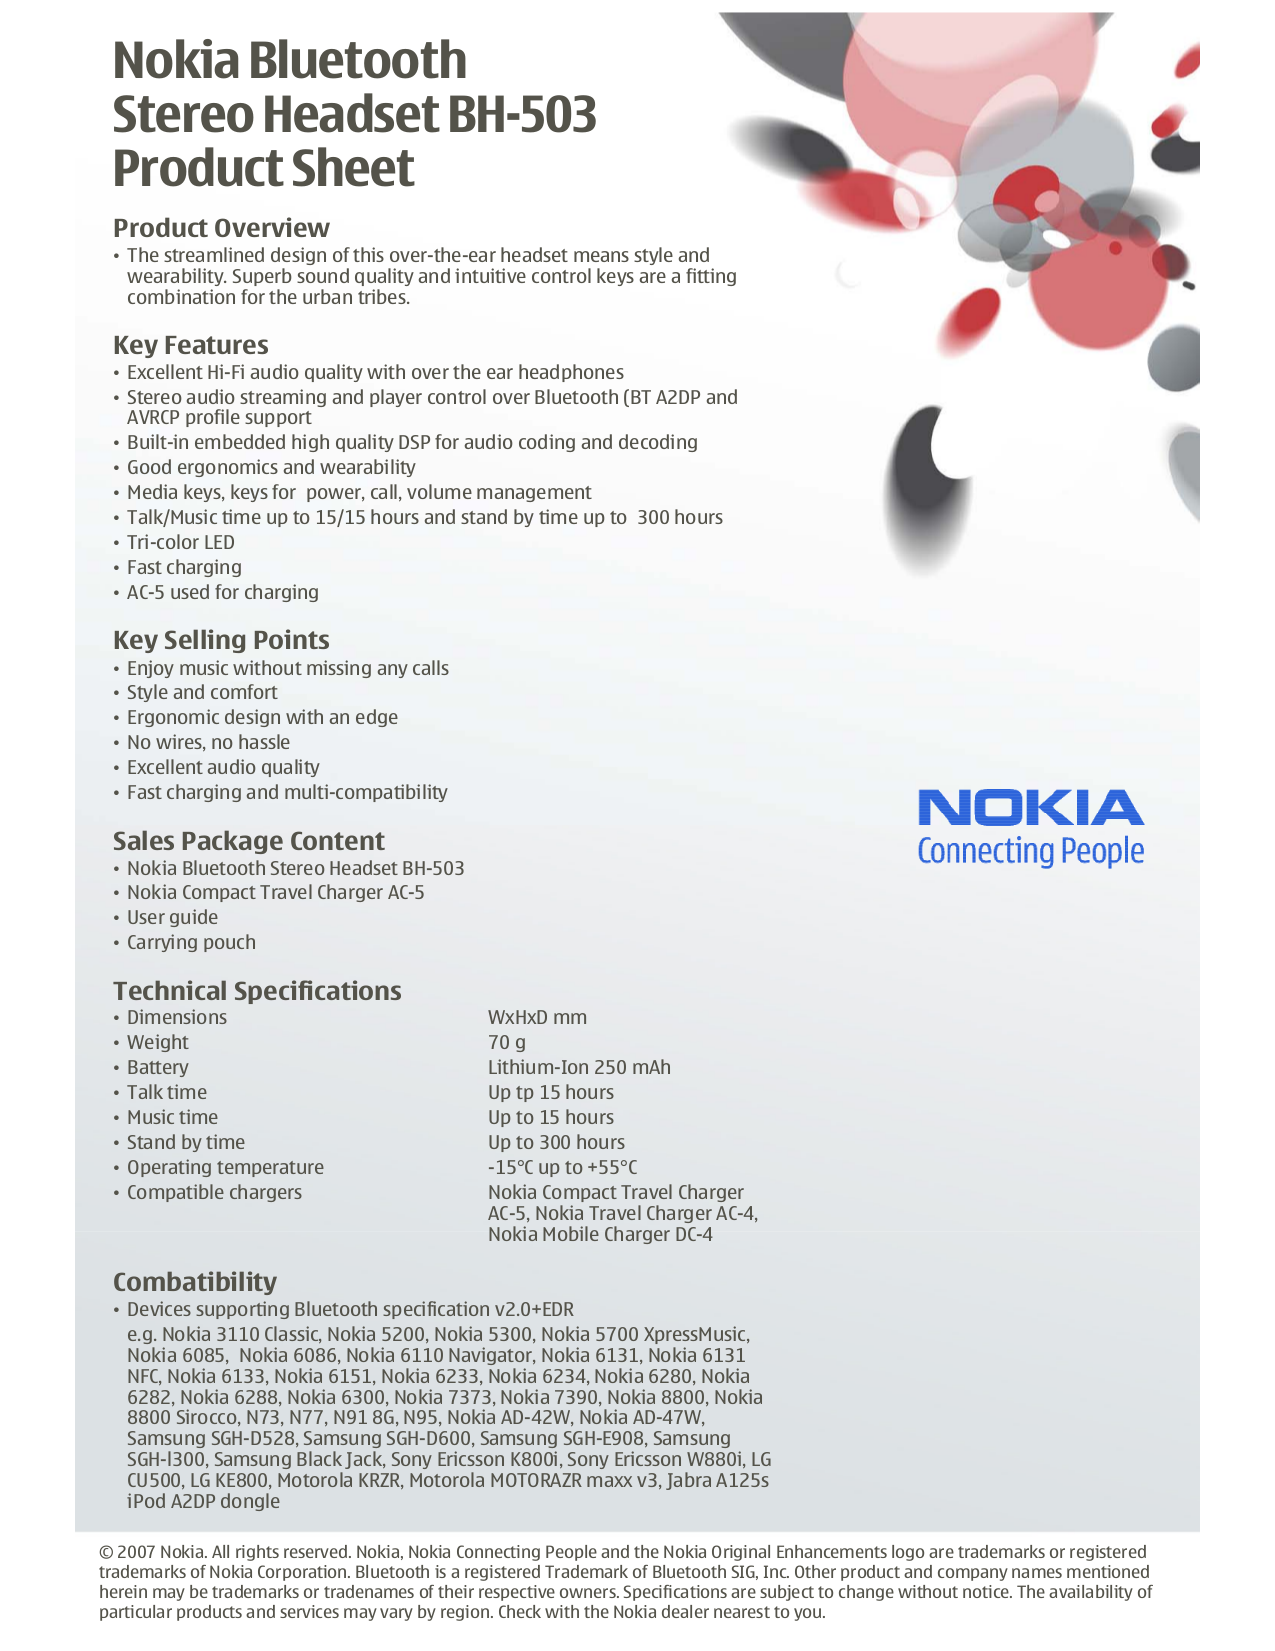 pdf for Nokia Headset BH-803 manual